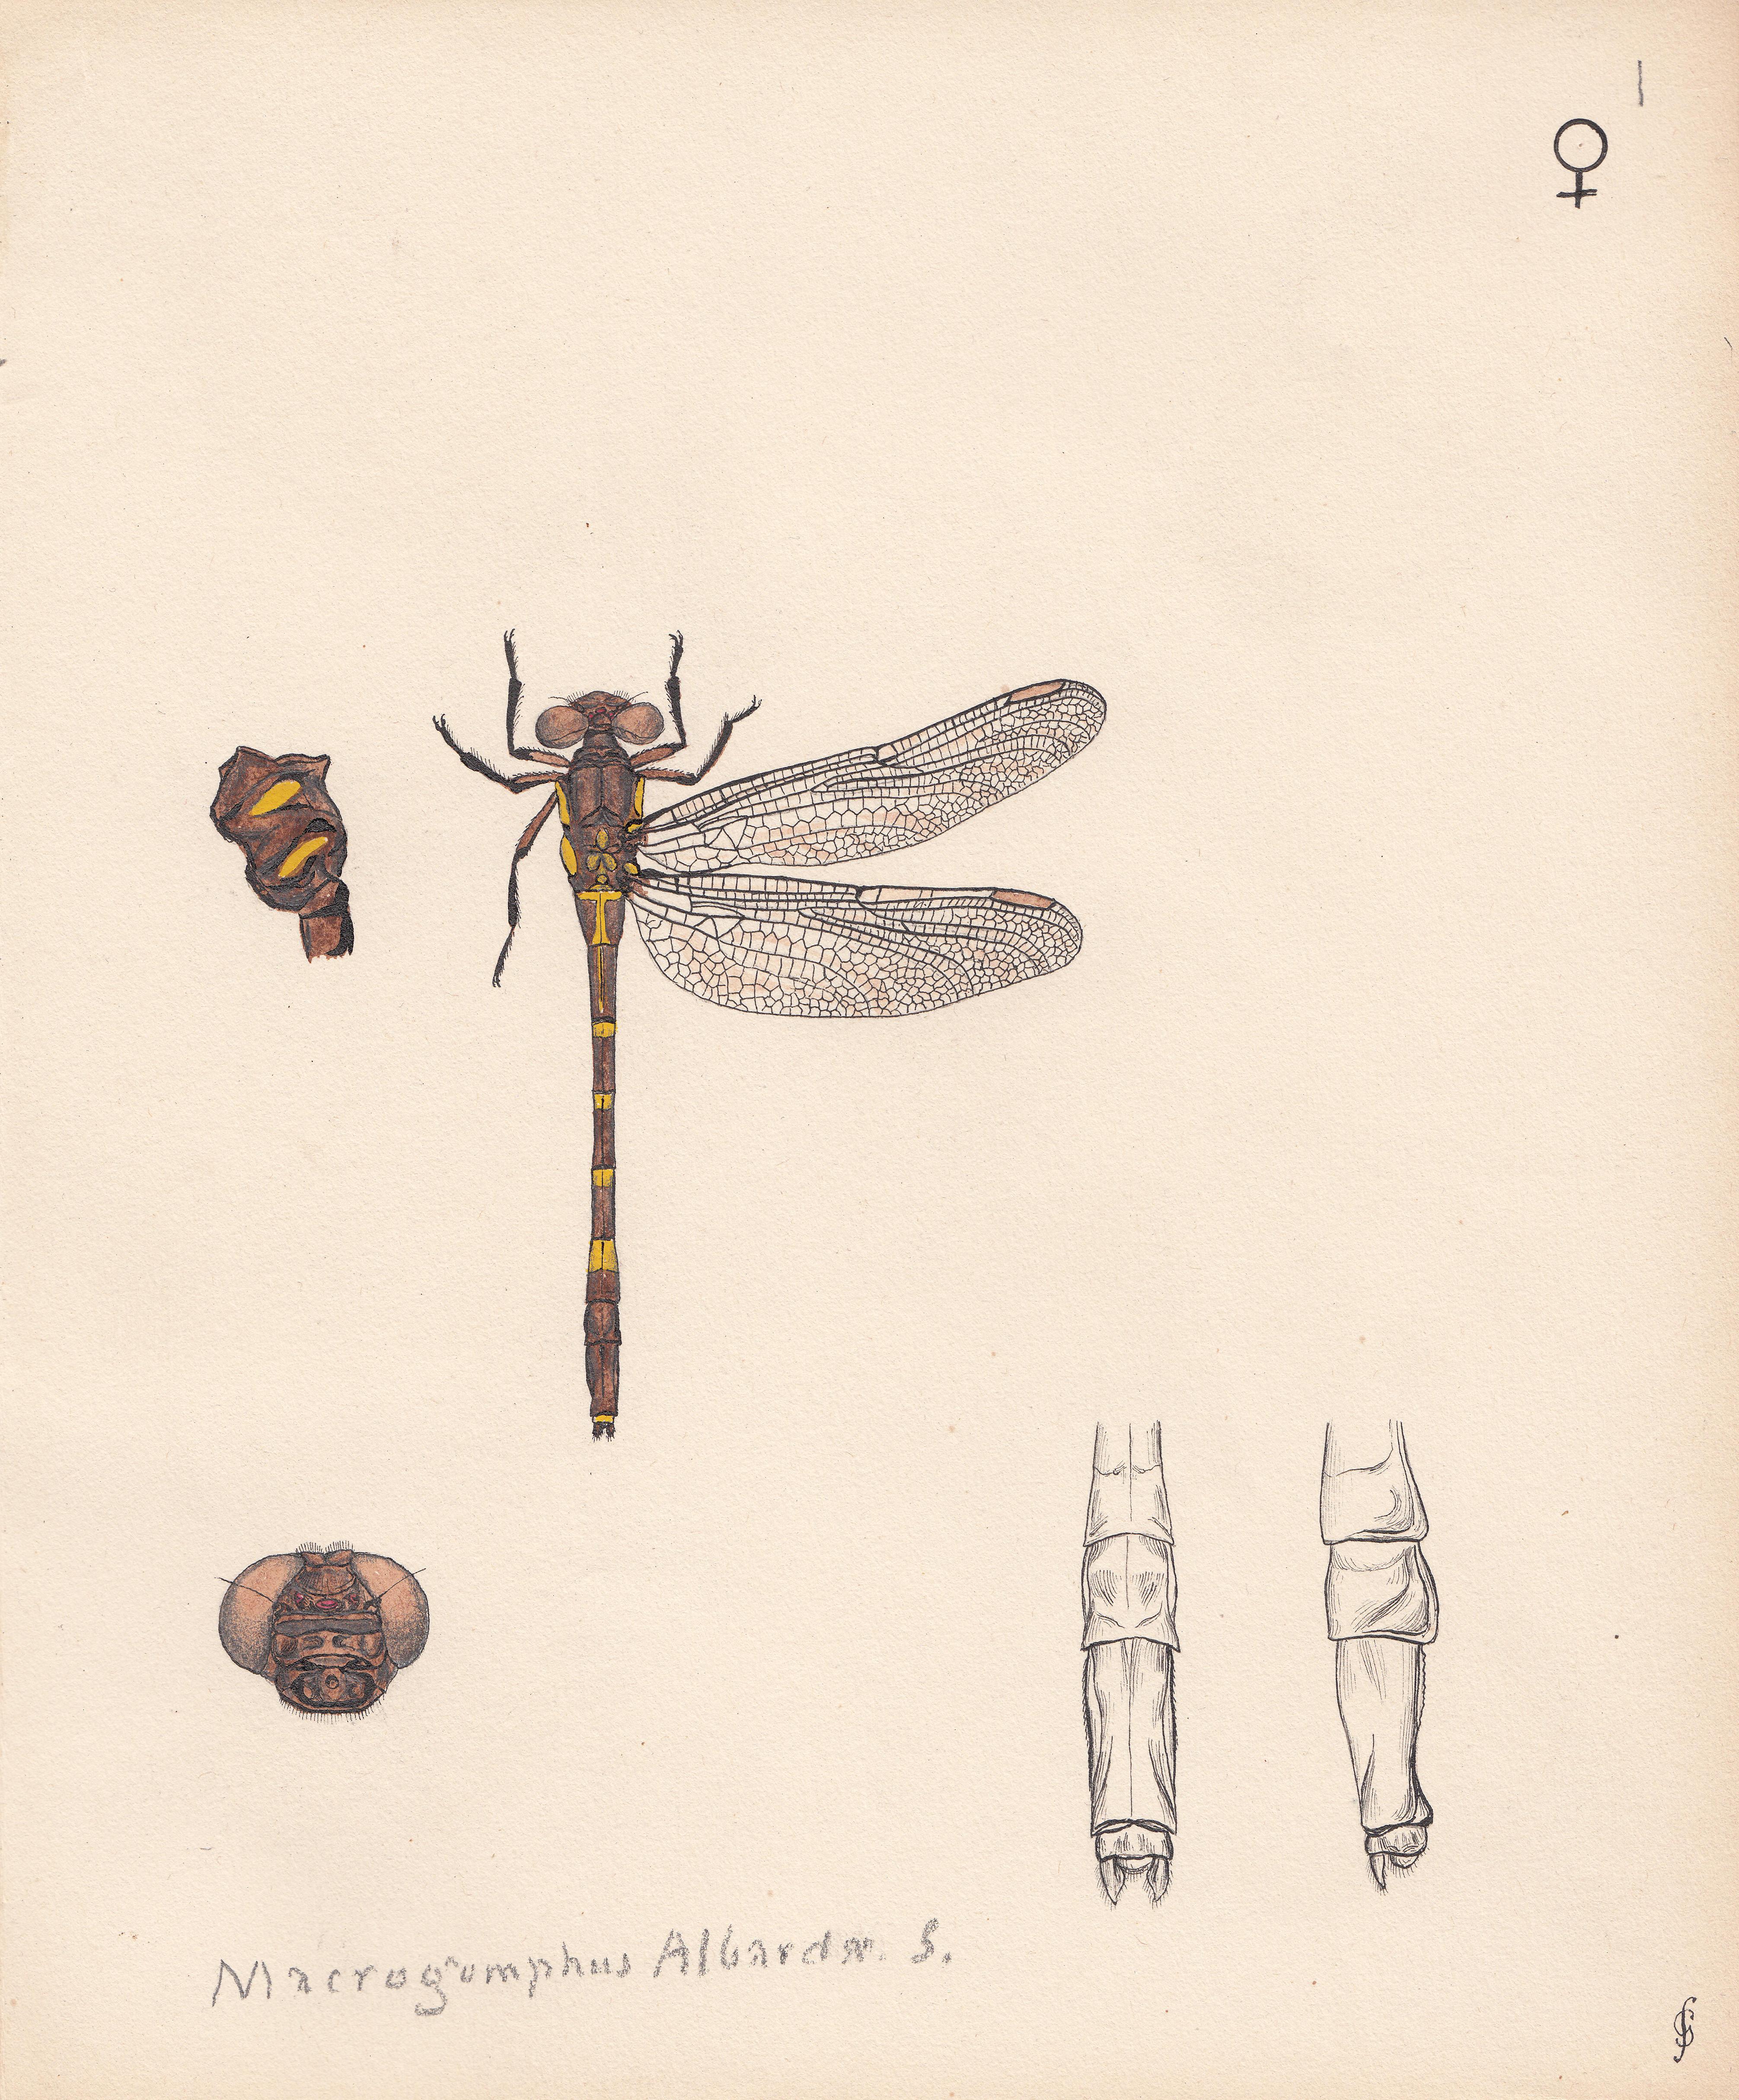 Macrogomphus albardae.jpg